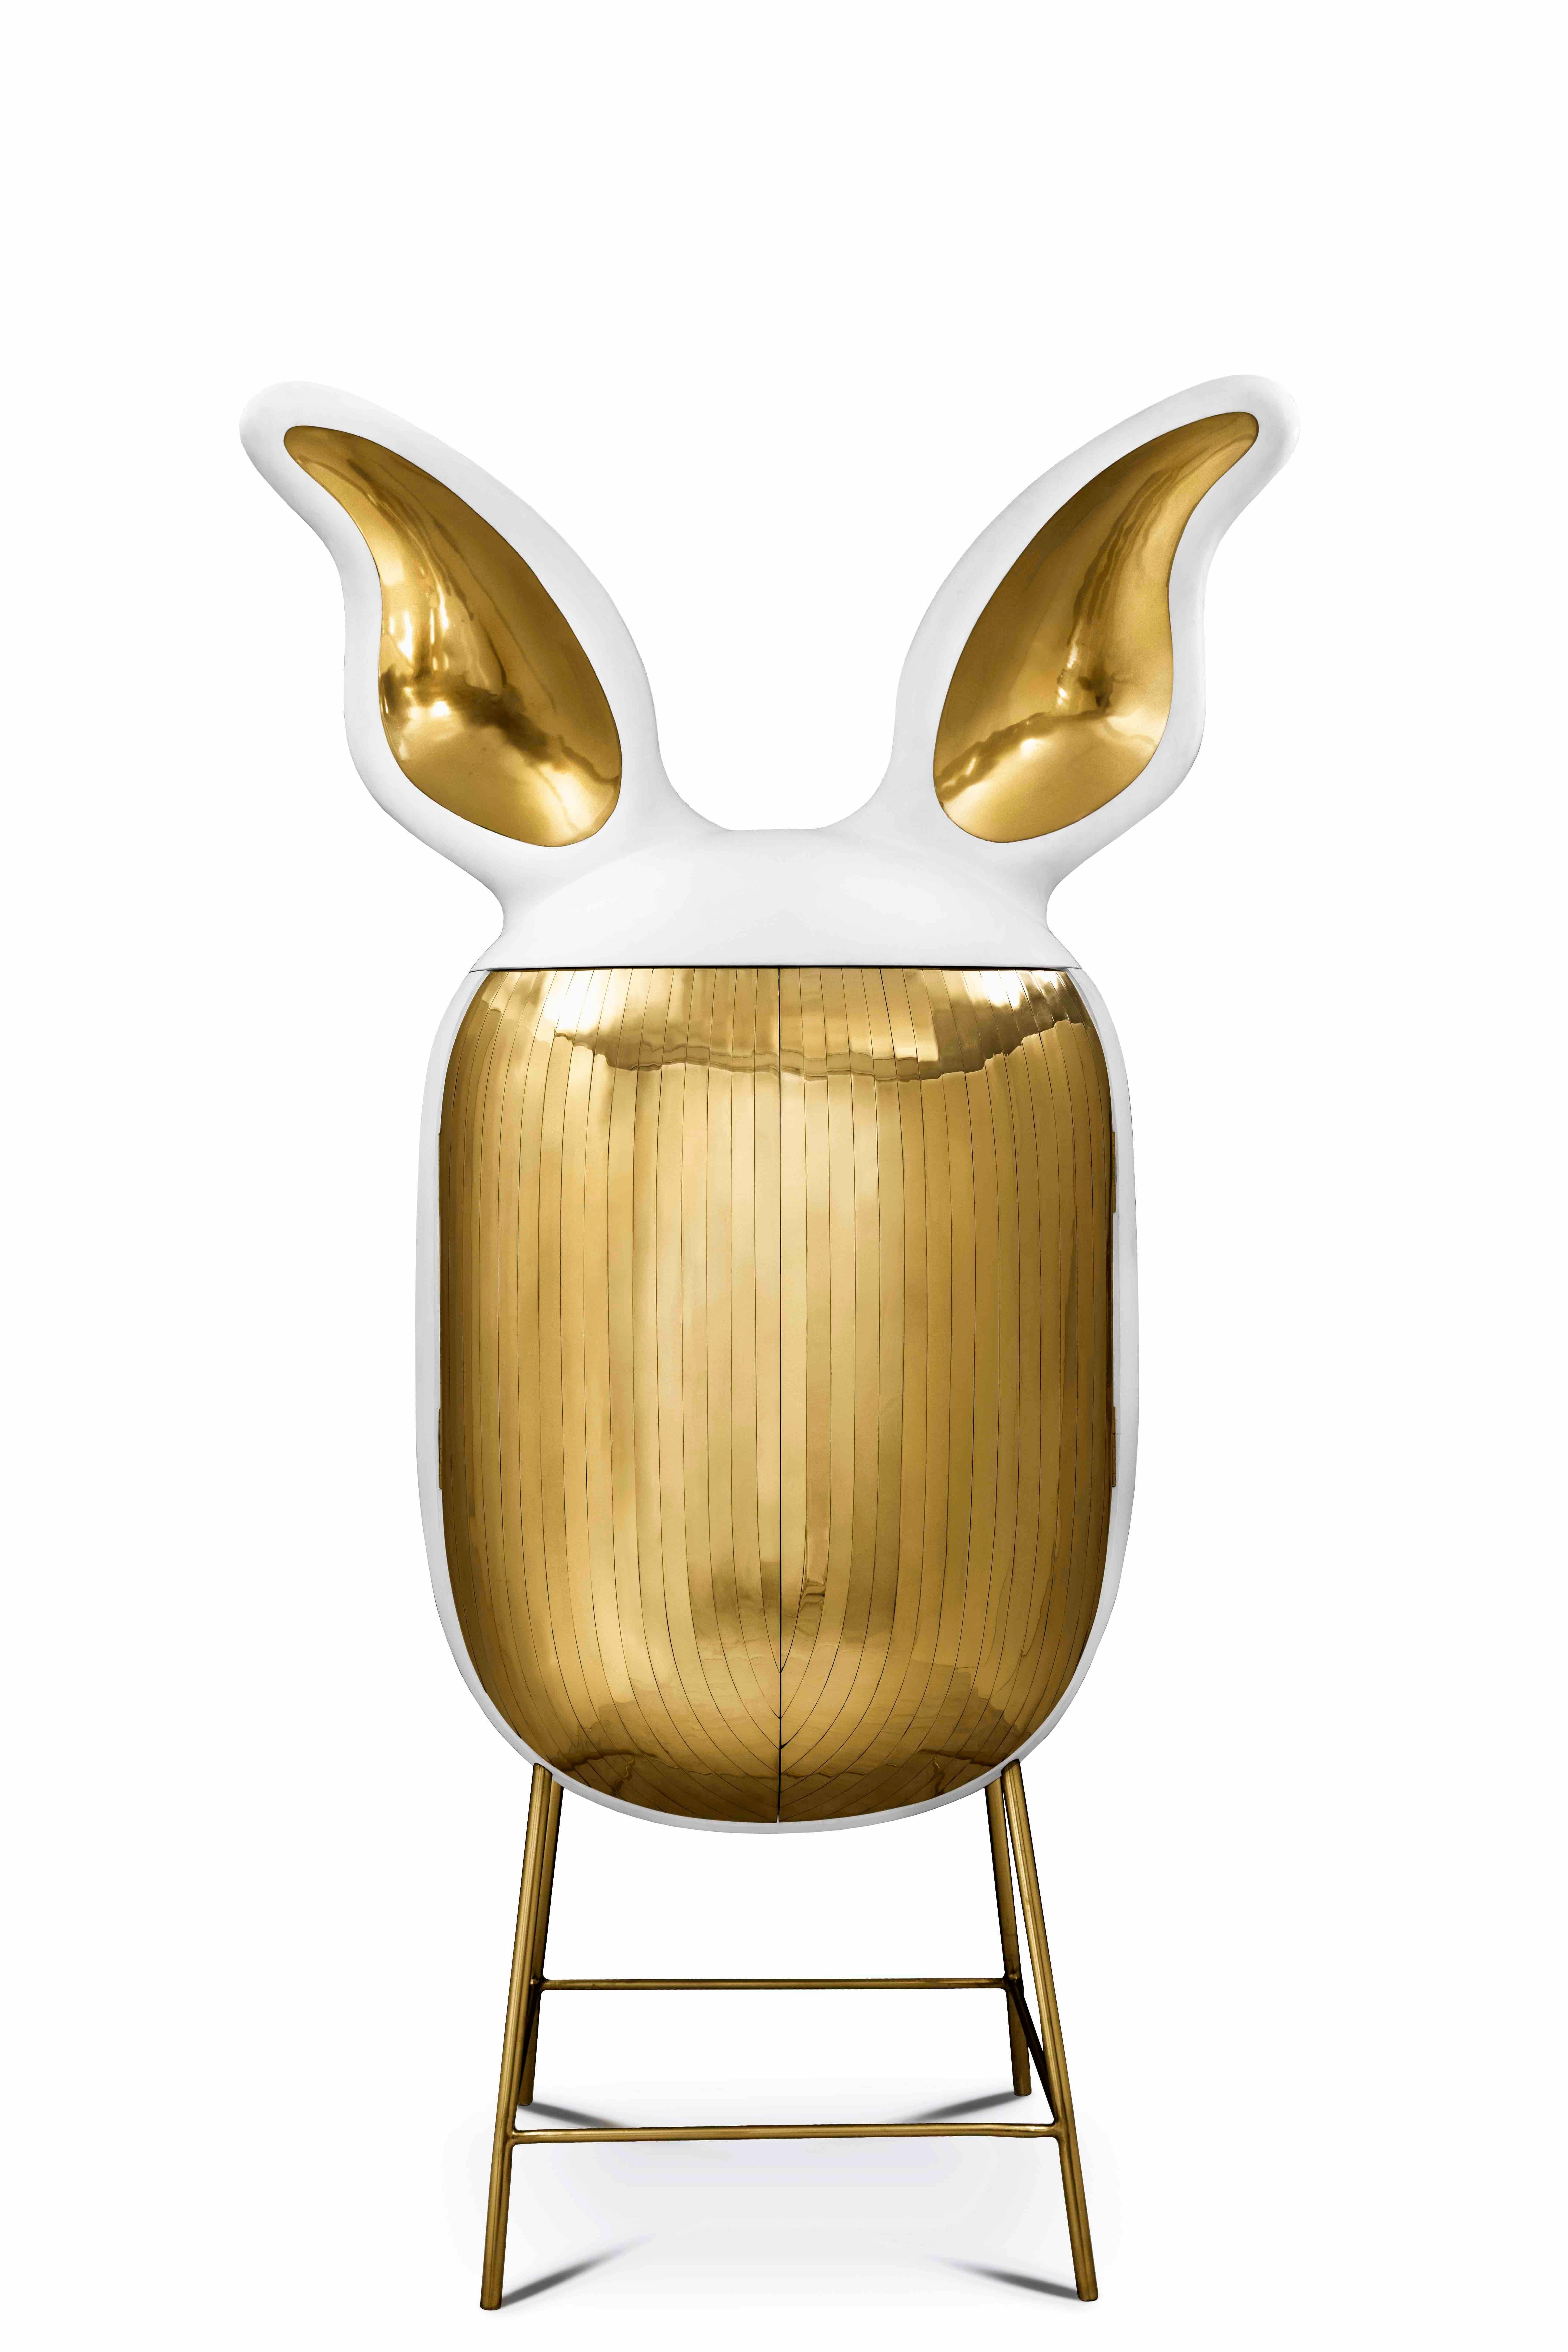 Mimi Bar Storage Cabinet with Brass Inlay by Matteo Cibic